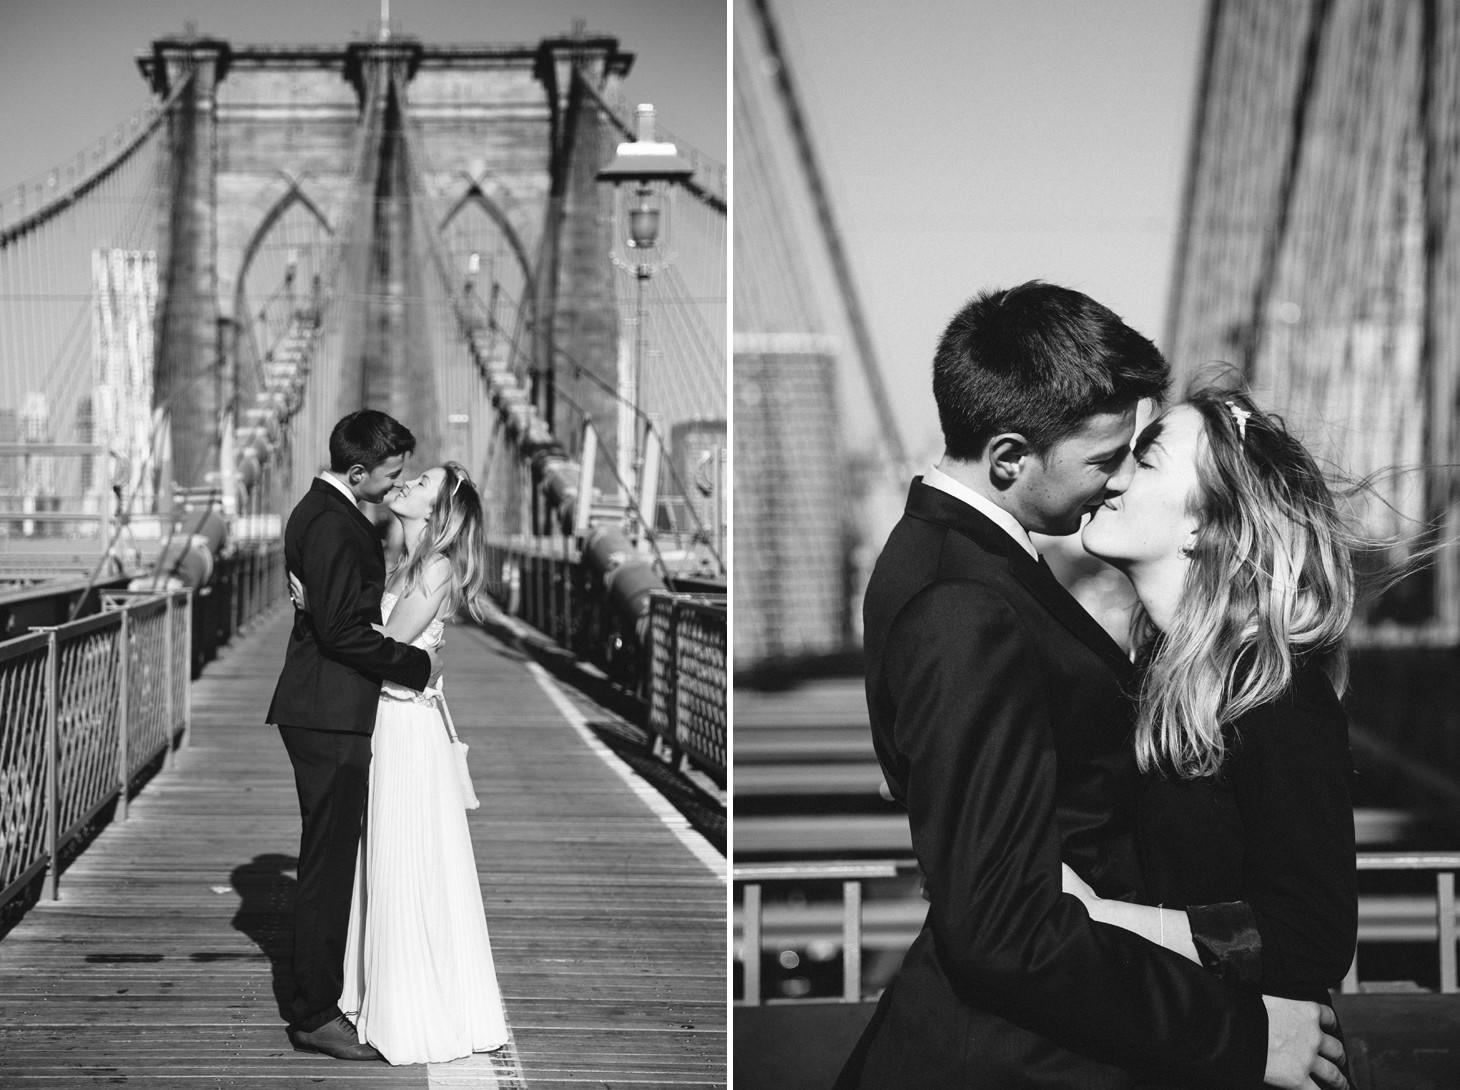 nyc-wedding-photographer-brooklyn-bridge-smitten-chickens-photo012.jpg